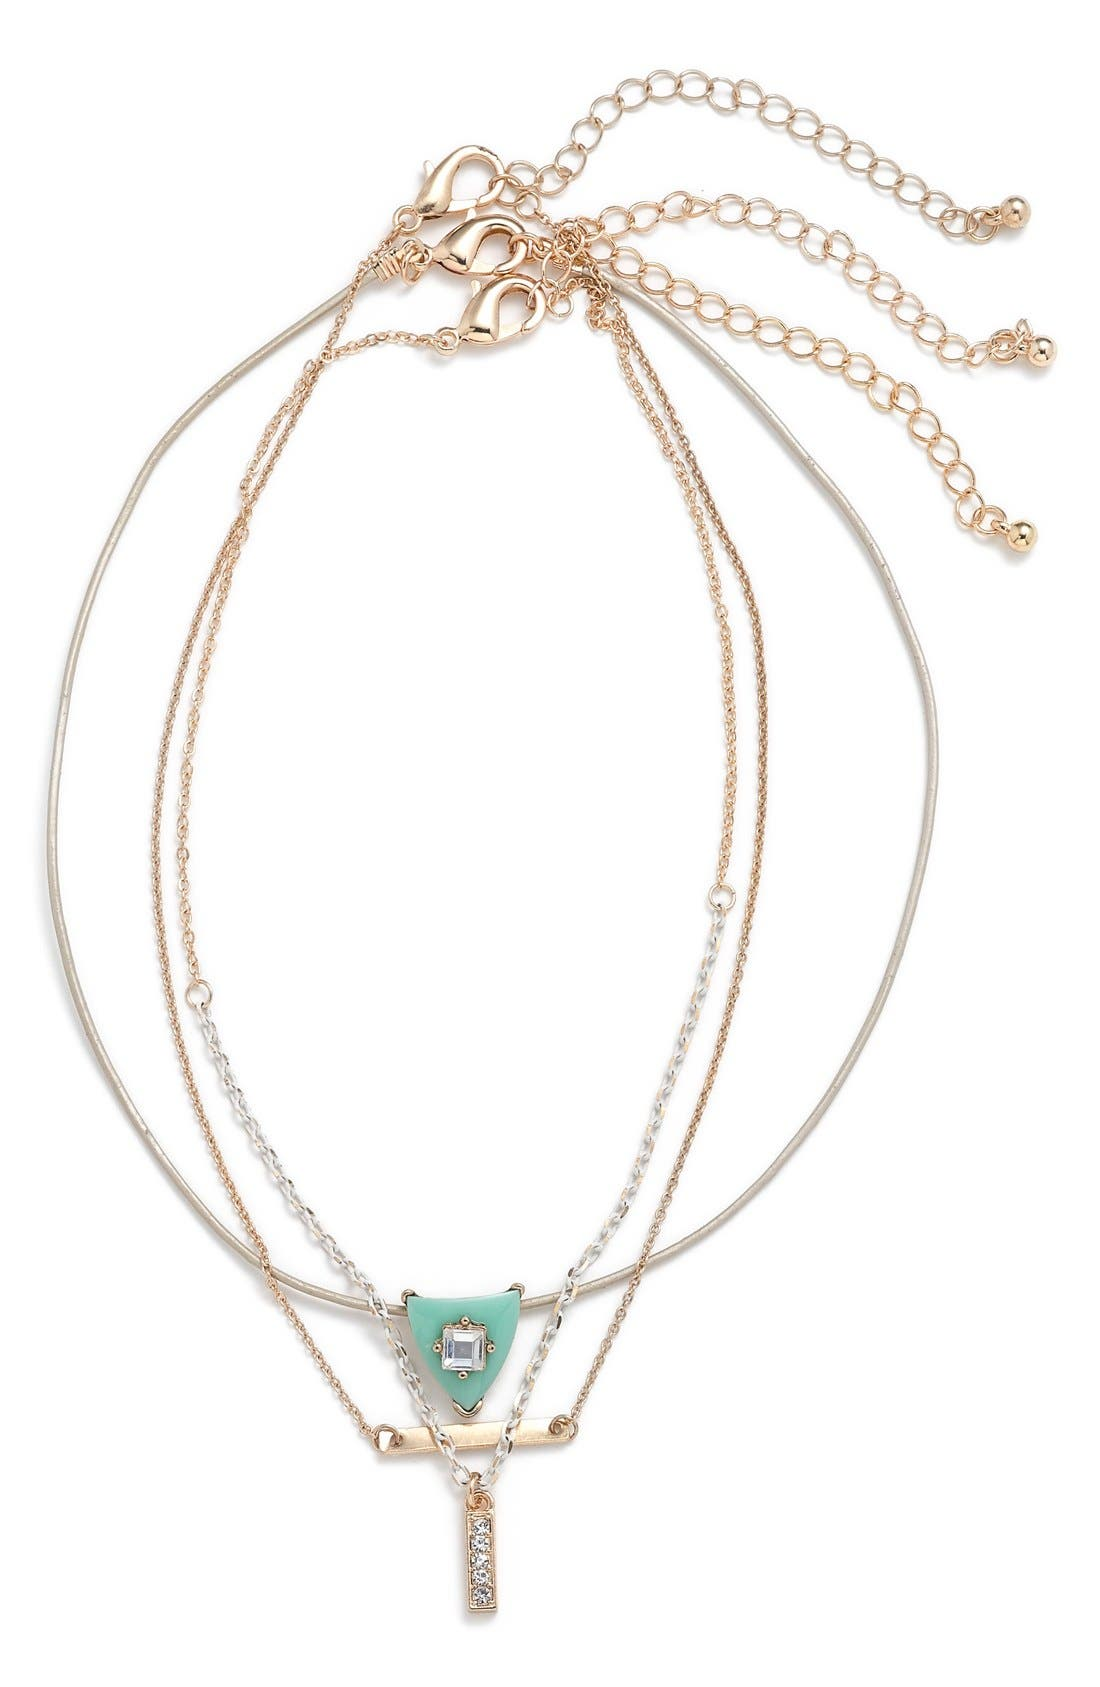 Alternate Image 1 Selected - BP. Choker Necklace (Set of 3)